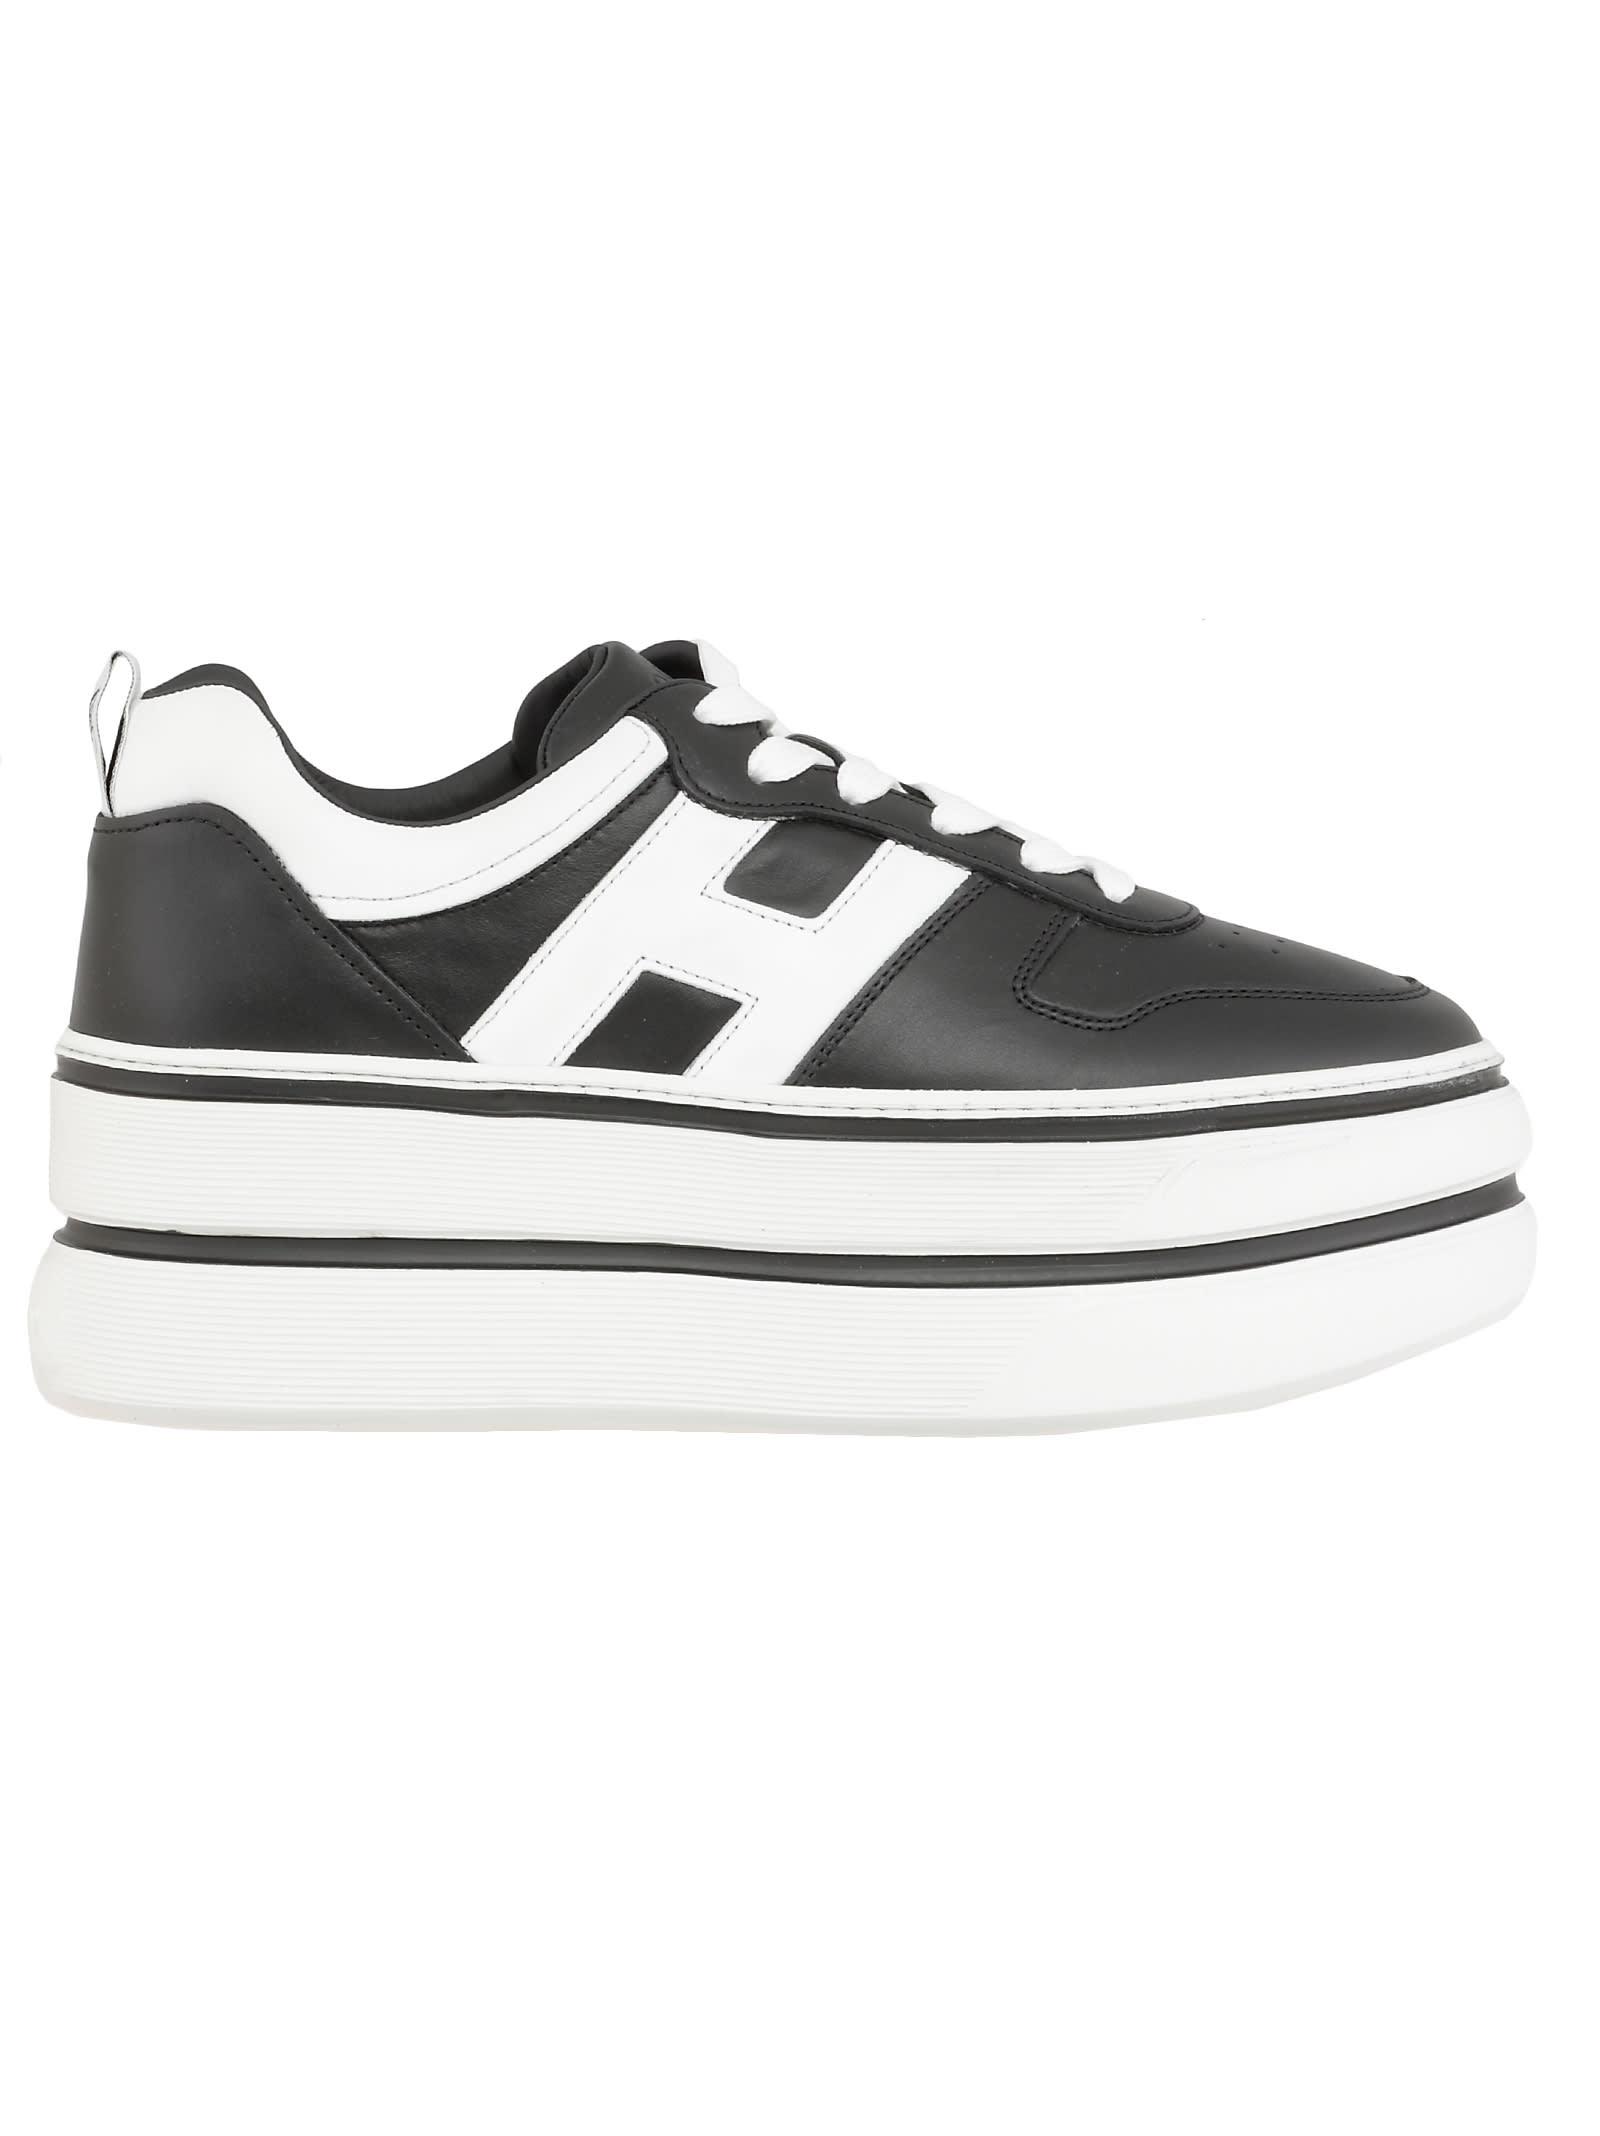 Hogan H449 Sneaker